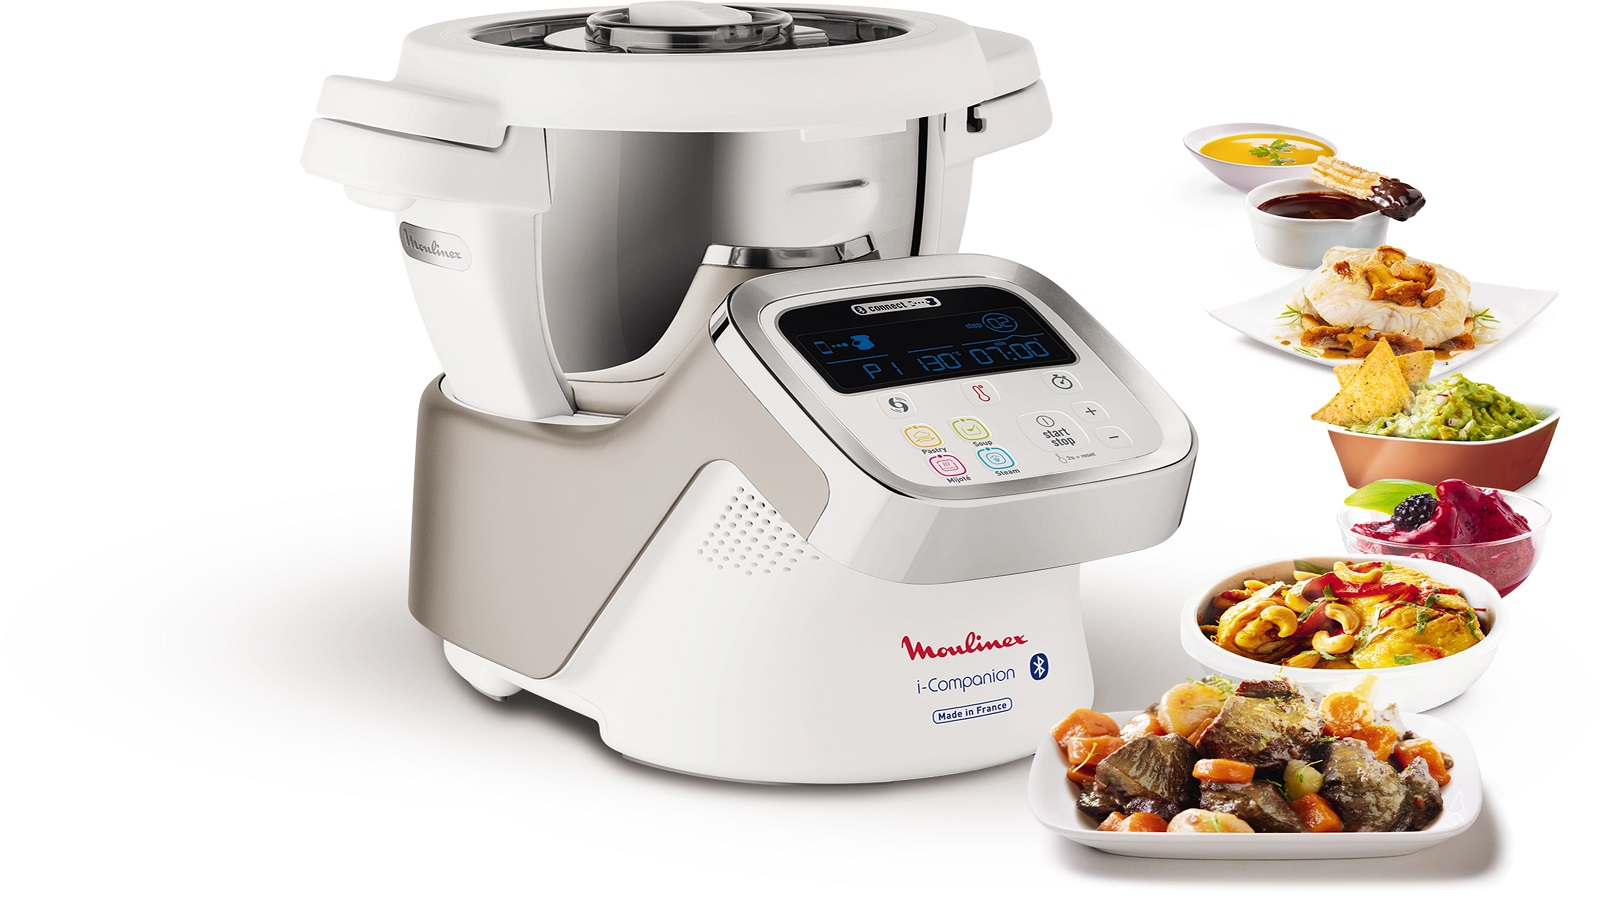 Robot da cucina Moulinex: confronto col vecchio e con Bimby I ...